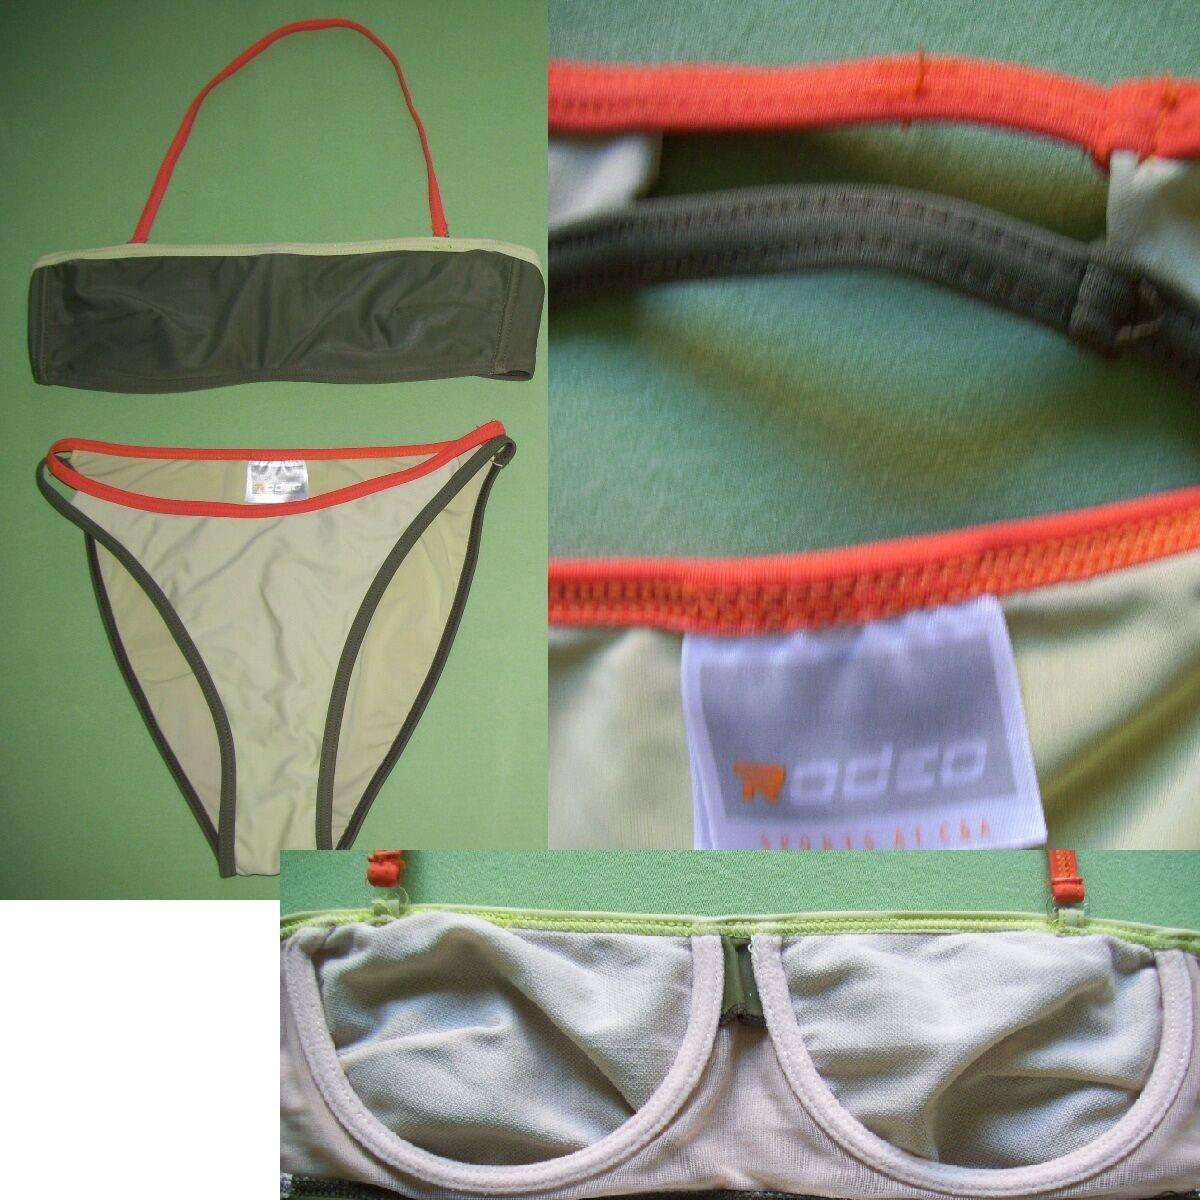 Rodeo C&A Bikini Gr.40 Bandeauoberteil m. Bügel + abnehmbaren Trägern